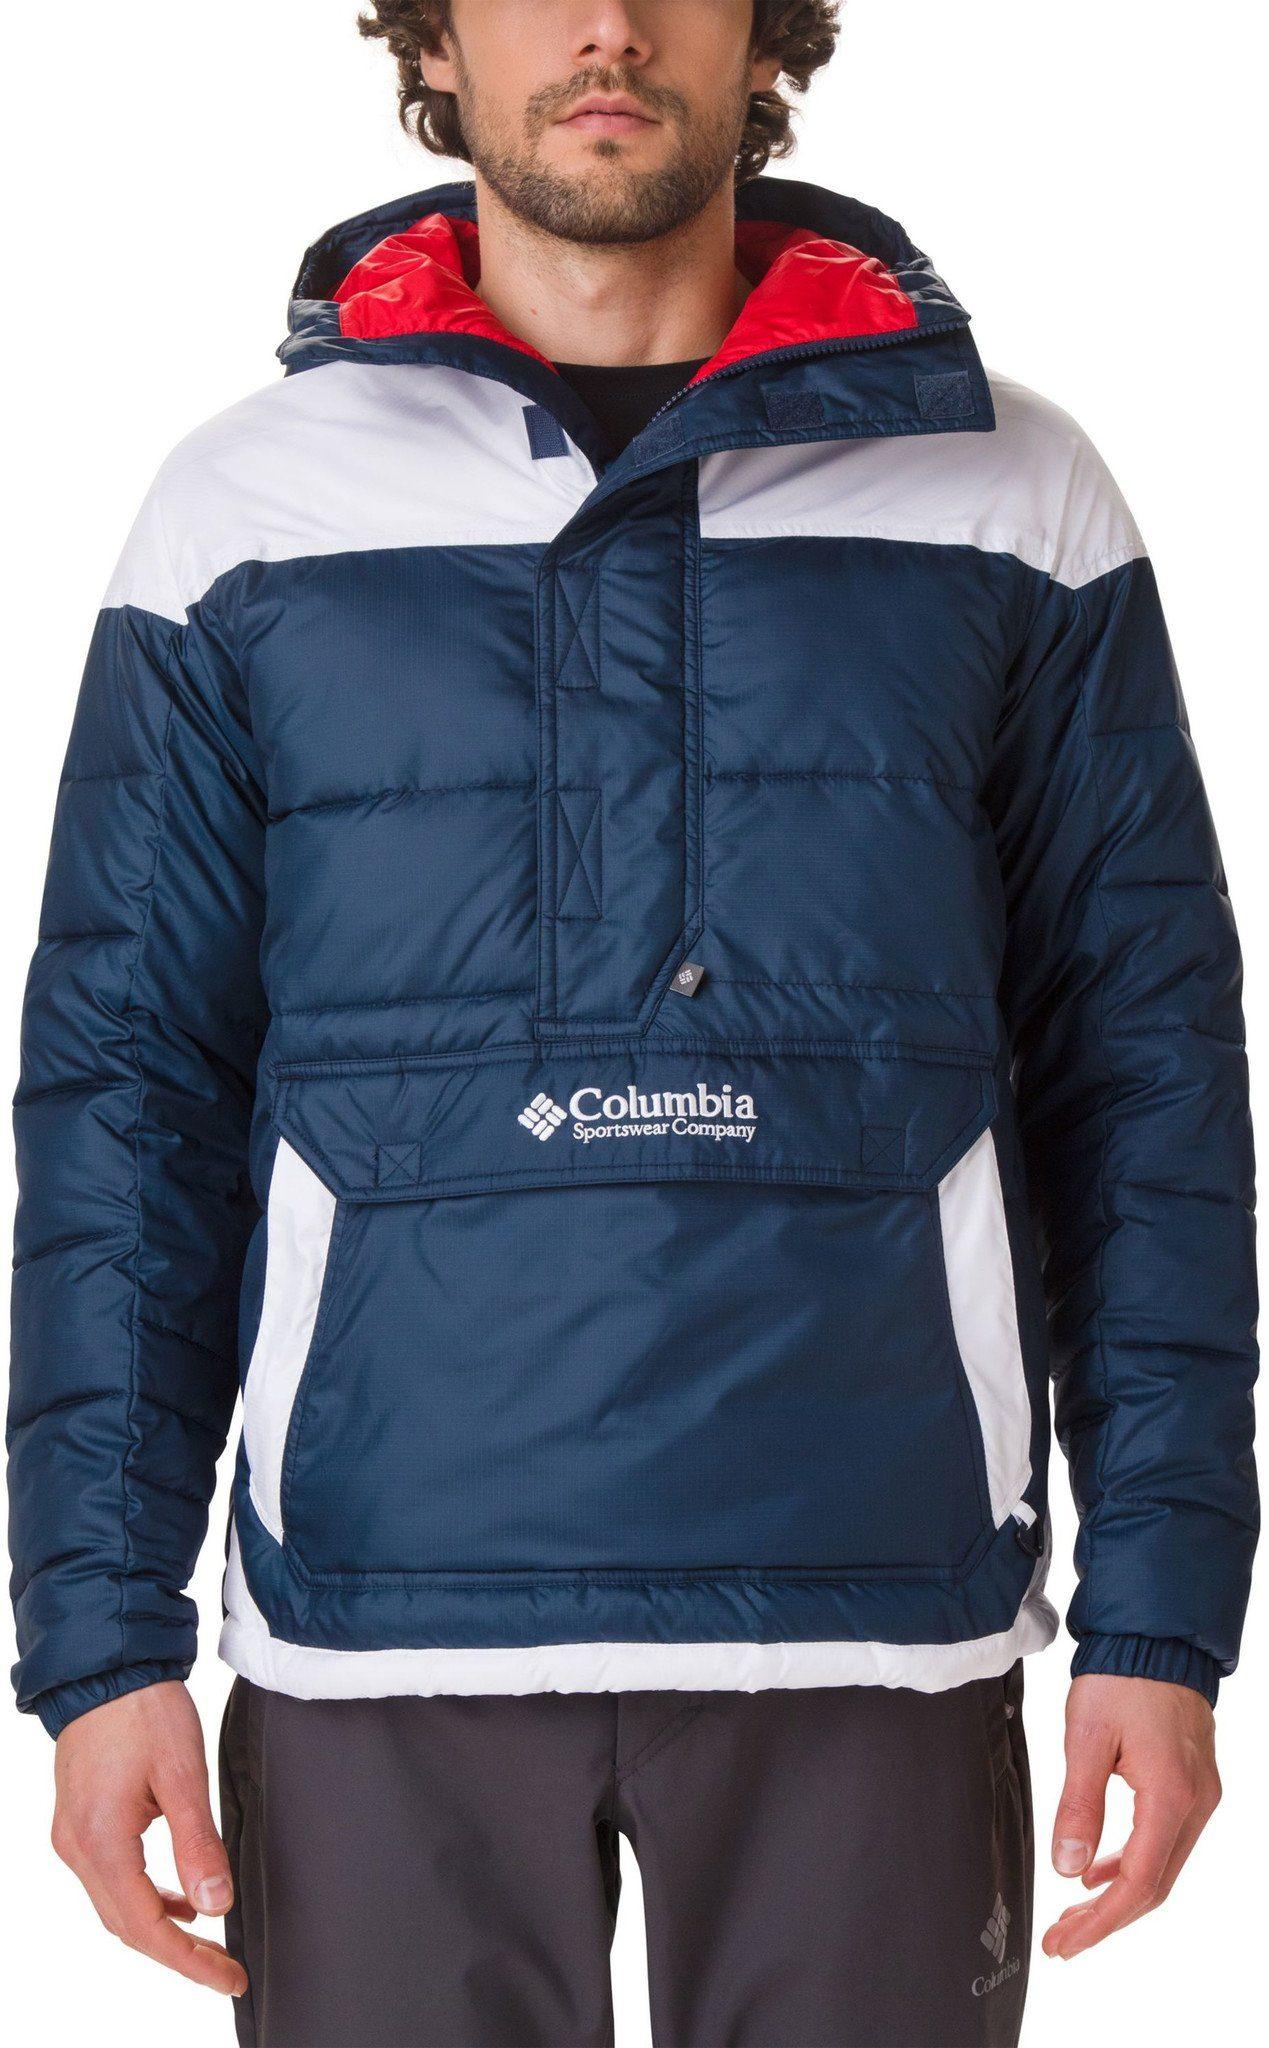 Columbia Outdoorjacke »Lodge Pullover Jacke Herren« online kaufen | OTTO